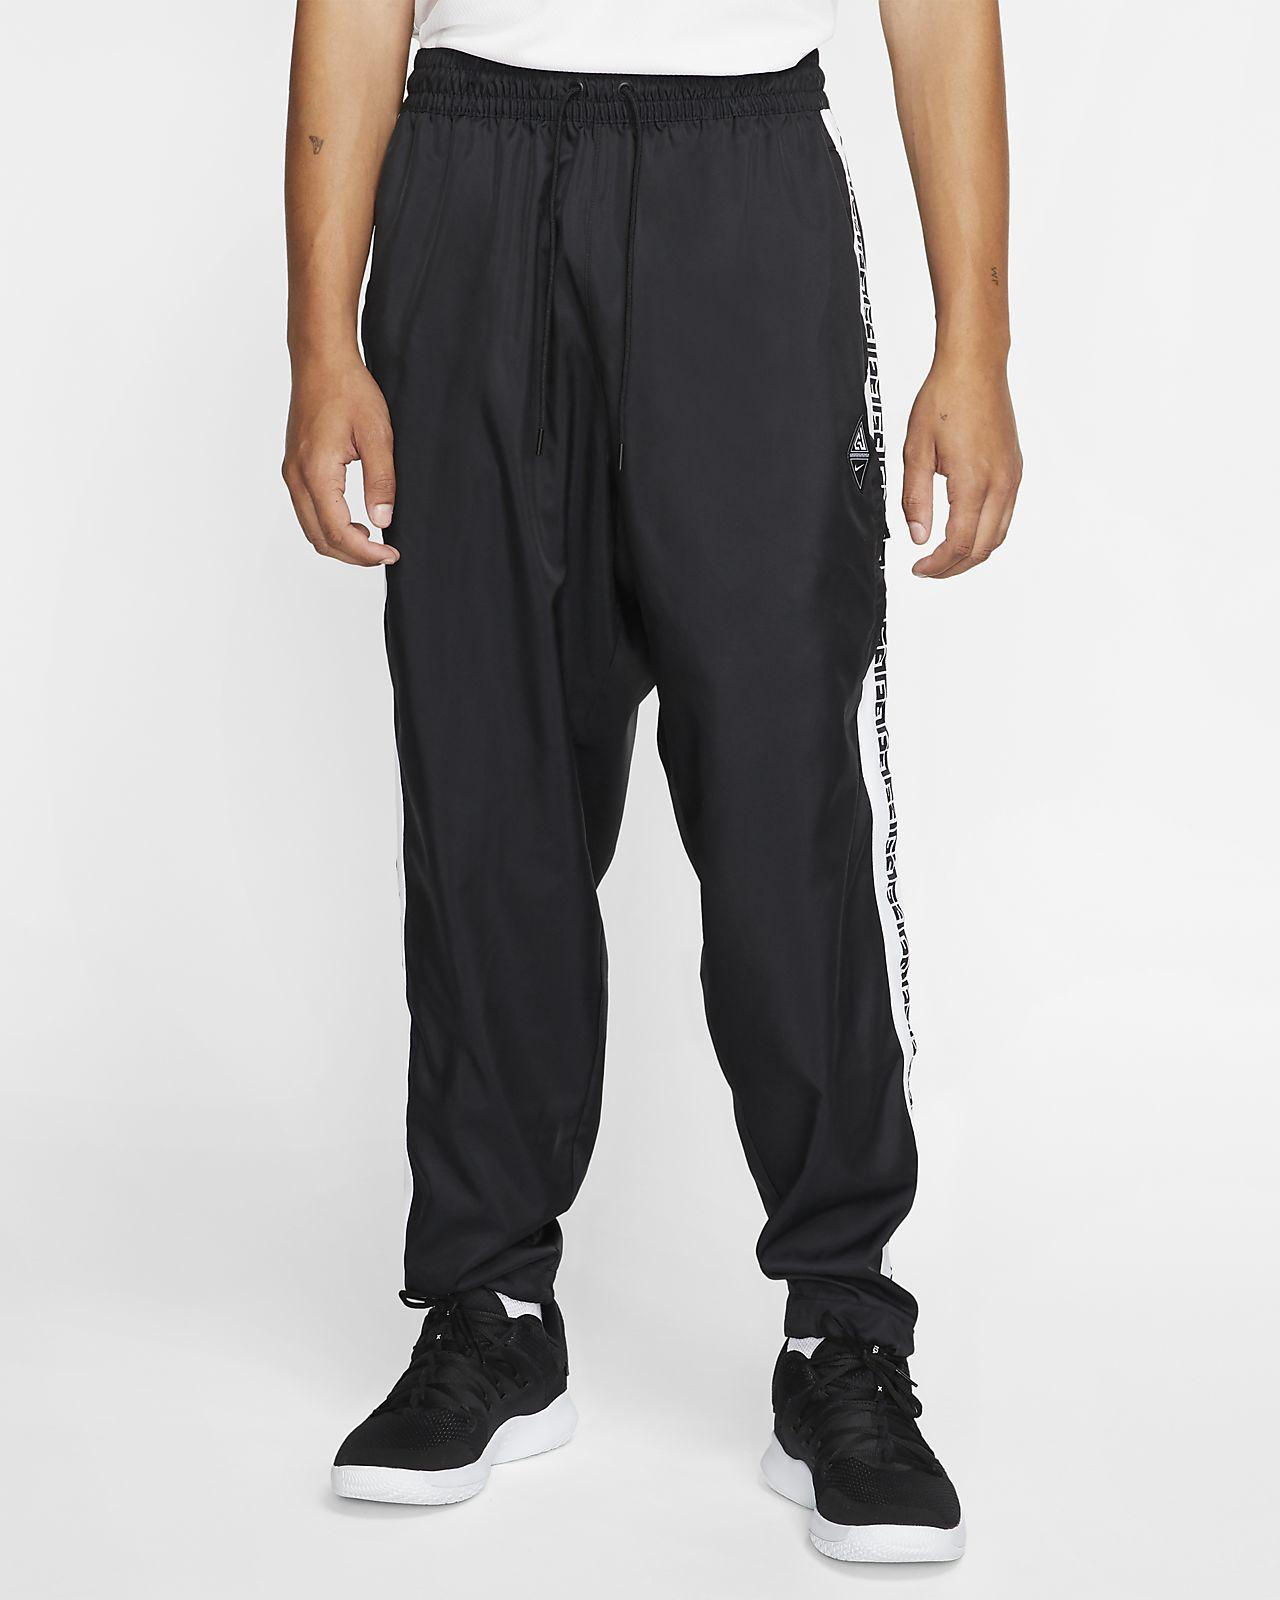 Giannis Pantalons esportius amb logotip de bàsquet - Home